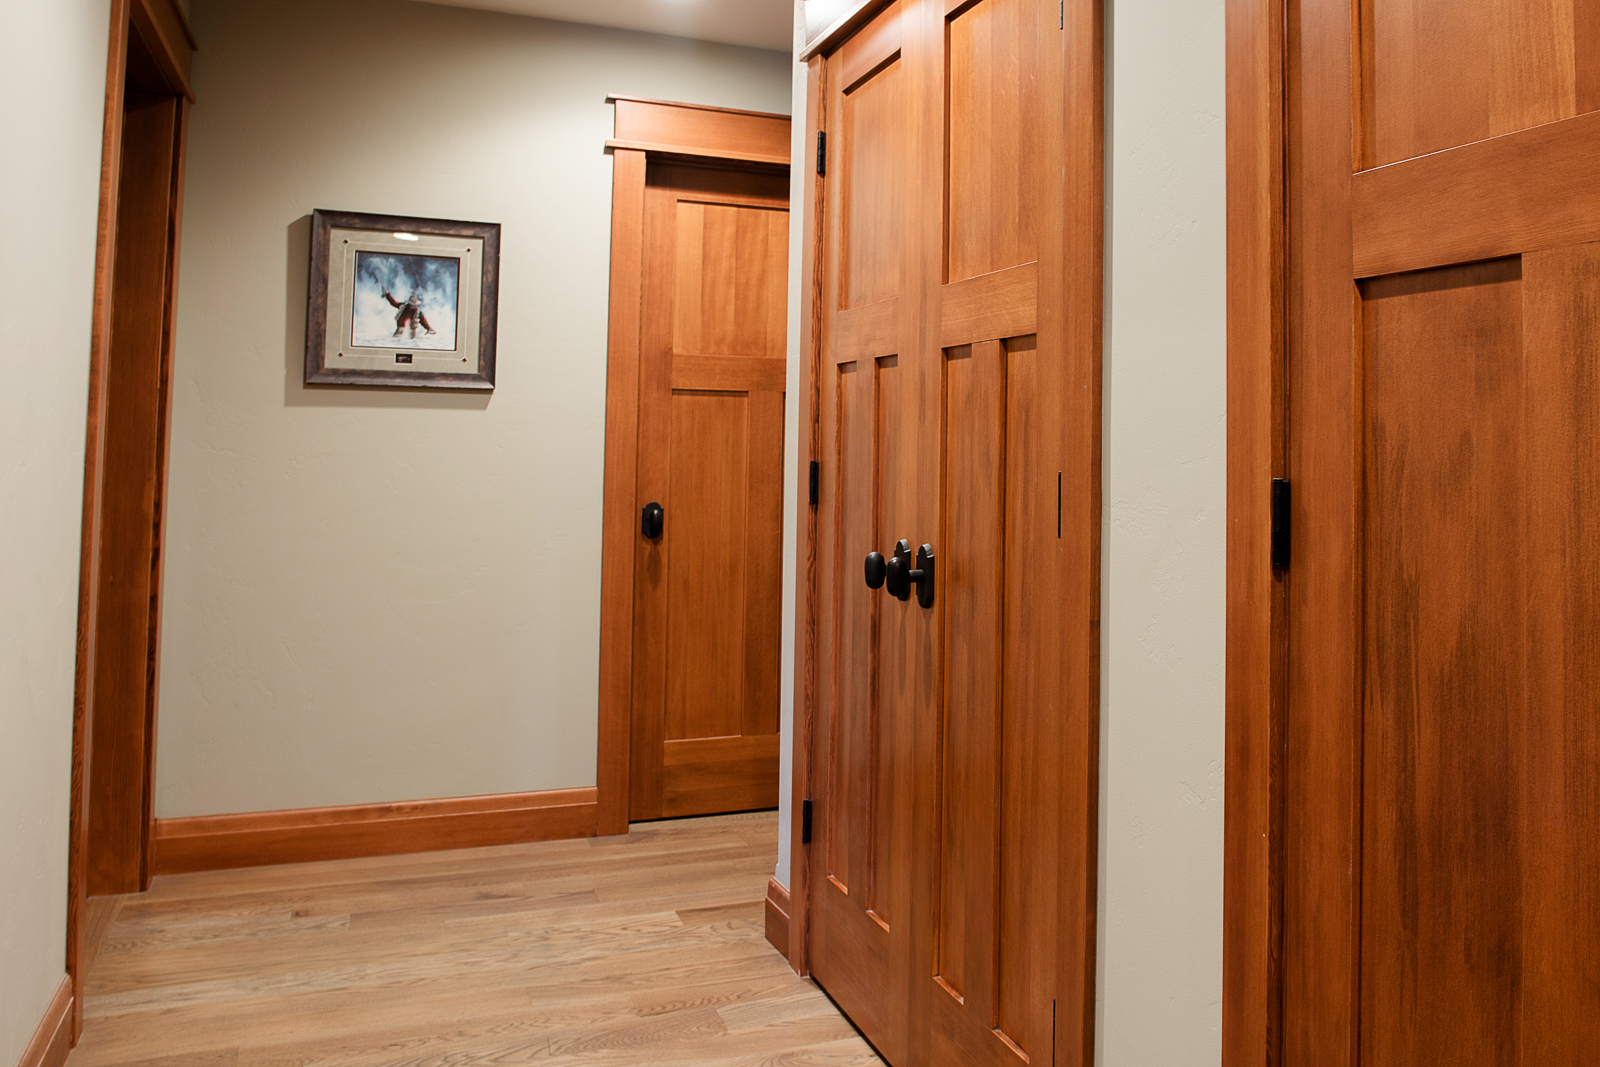 Woodworks-West-Bozeman-Montana-Builder-Cabinetry-Remodel-New-Construction-3638.jpg